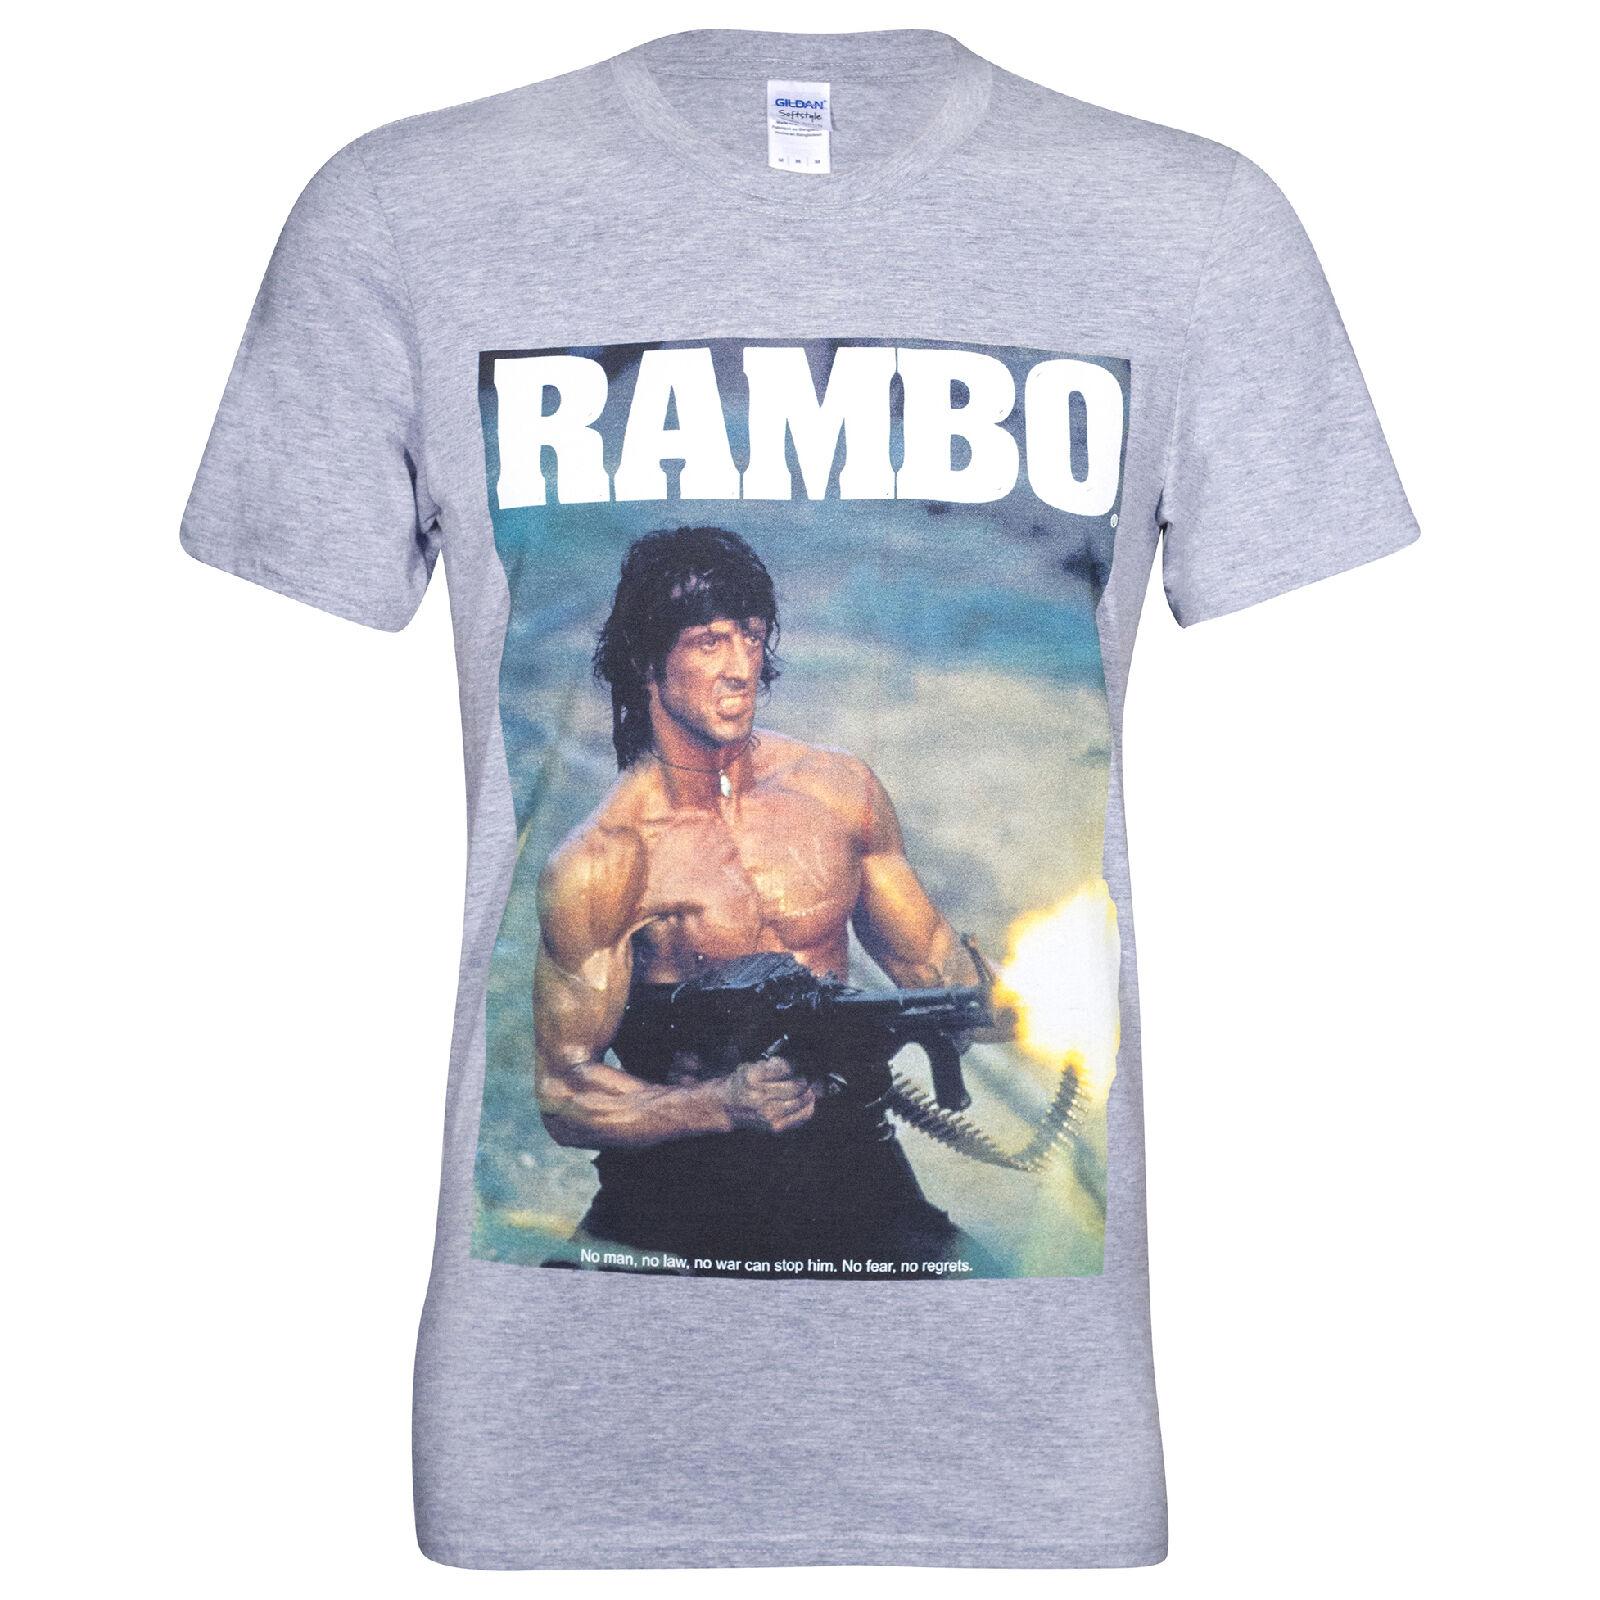 Geek Clothing Rambo Men's Gun T-Shirt - Grey - L - Grey